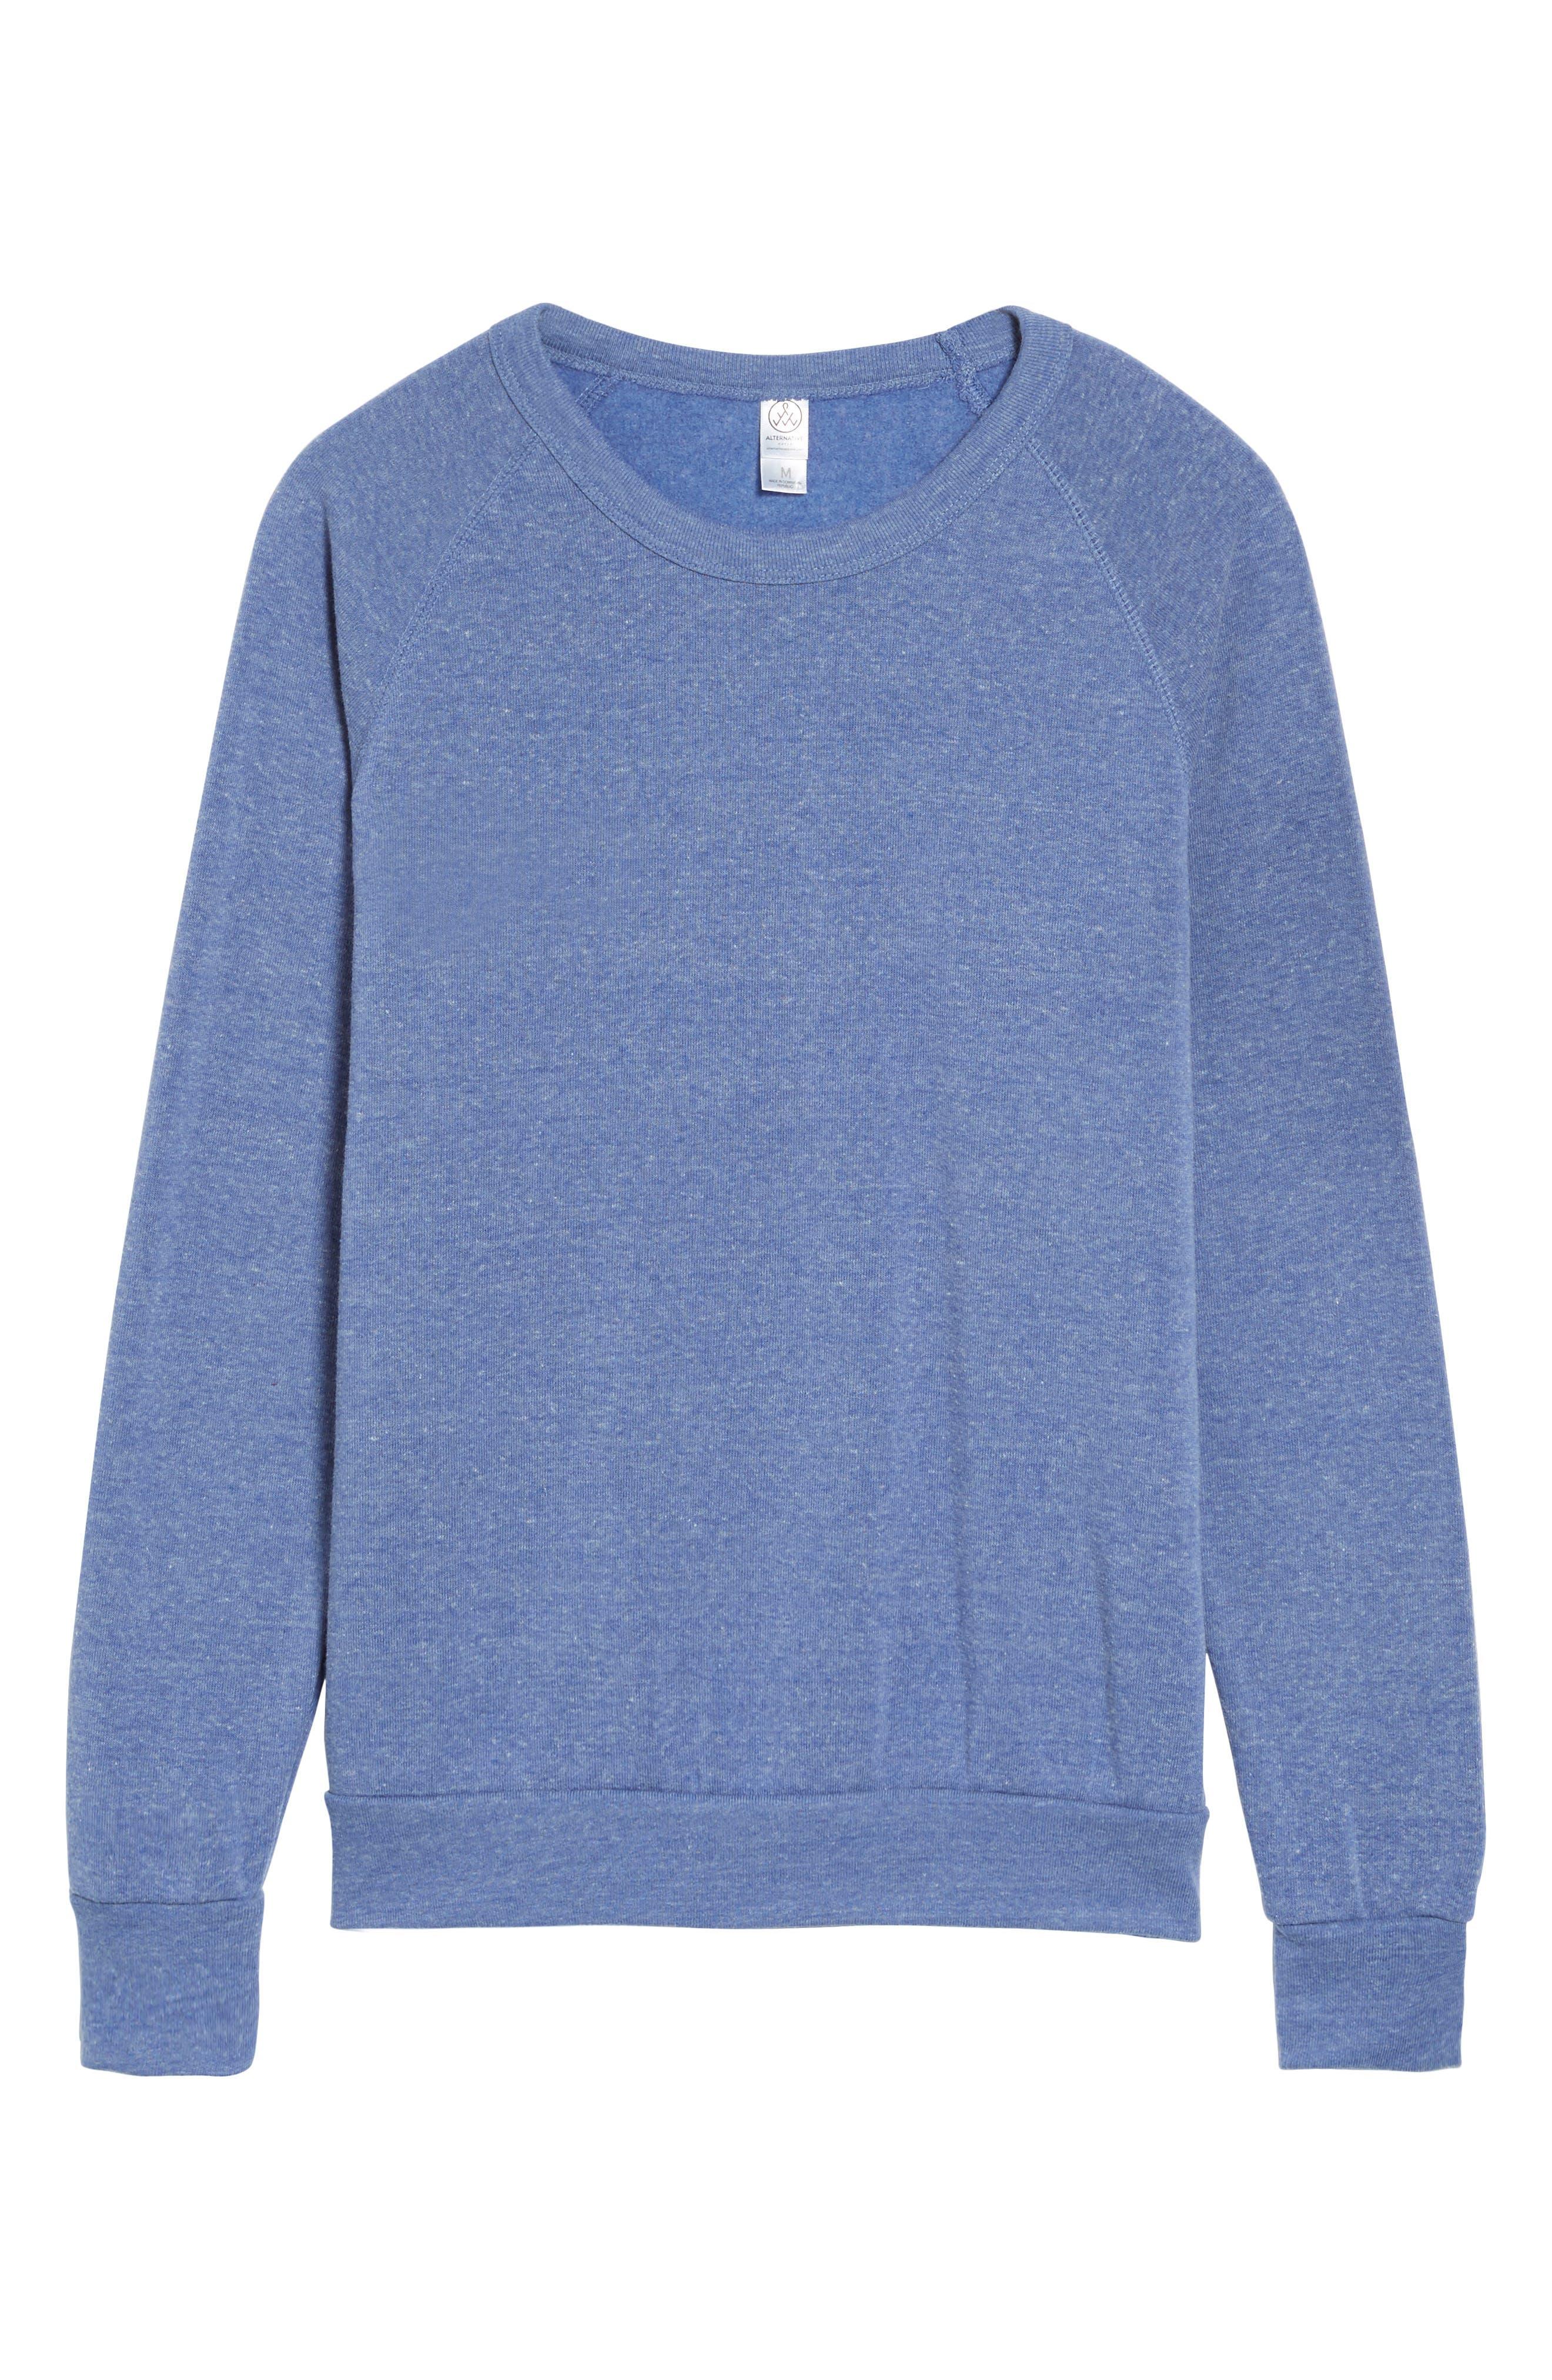 'The Champ' Sweatshirt,                             Alternate thumbnail 64, color,